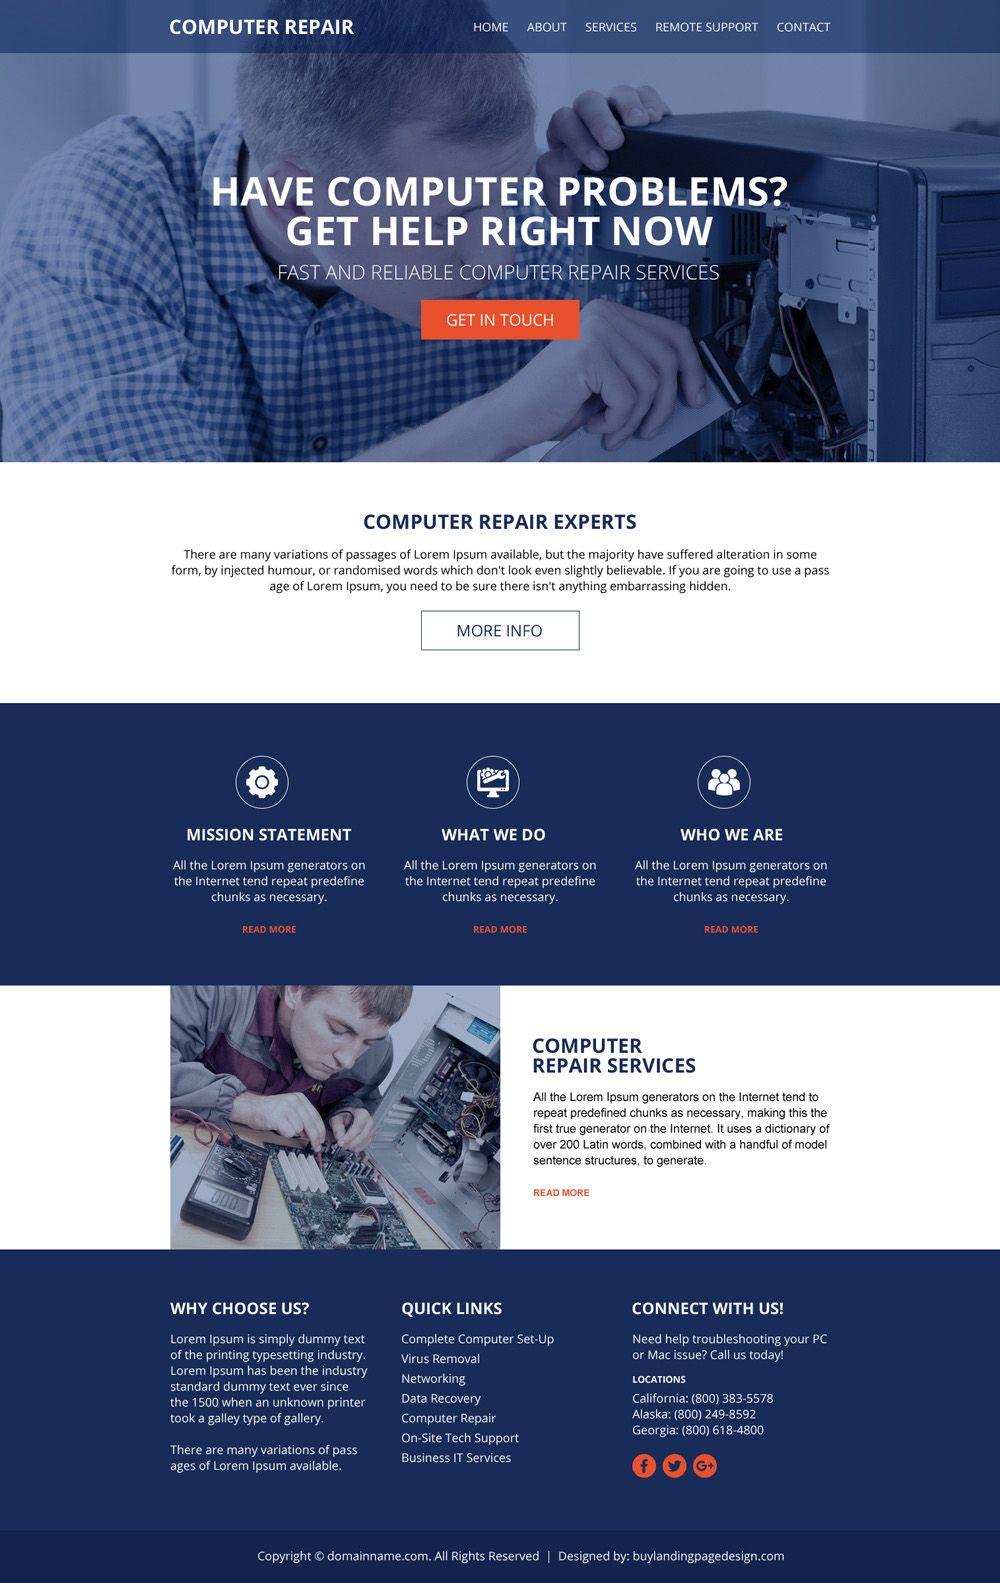 Download The Best Computer Repair Service Responsive Website Design To Create Professional C Computer Repair Services Computer Repair Responsive Website Design